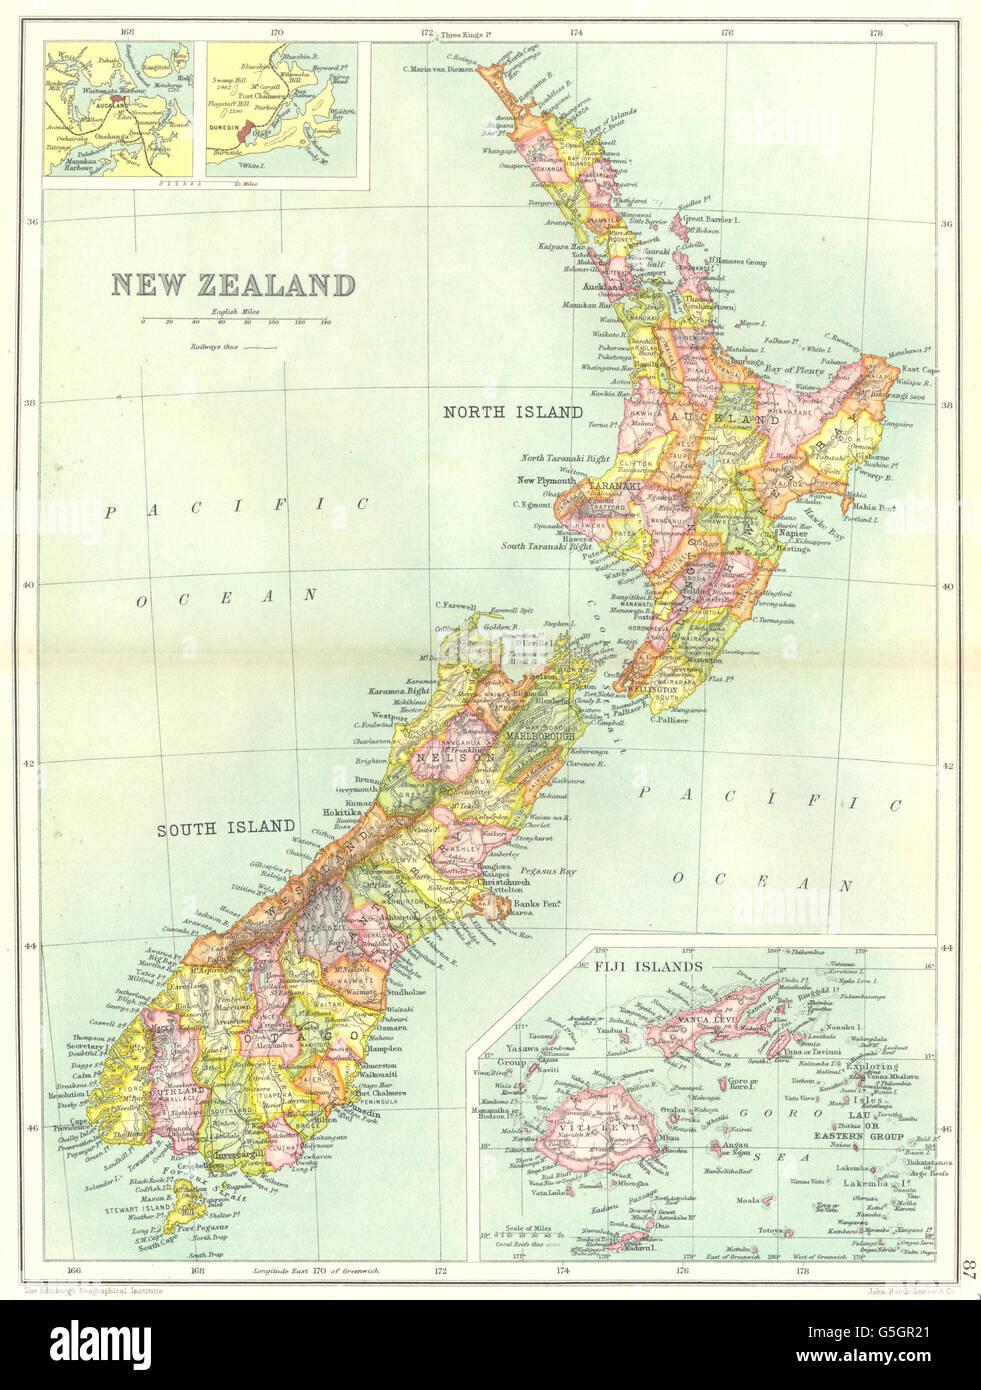 Dunedin Map New Zealand.New Zealand Inset Maps Of Fiji Islands Auckland Dunedin Railways